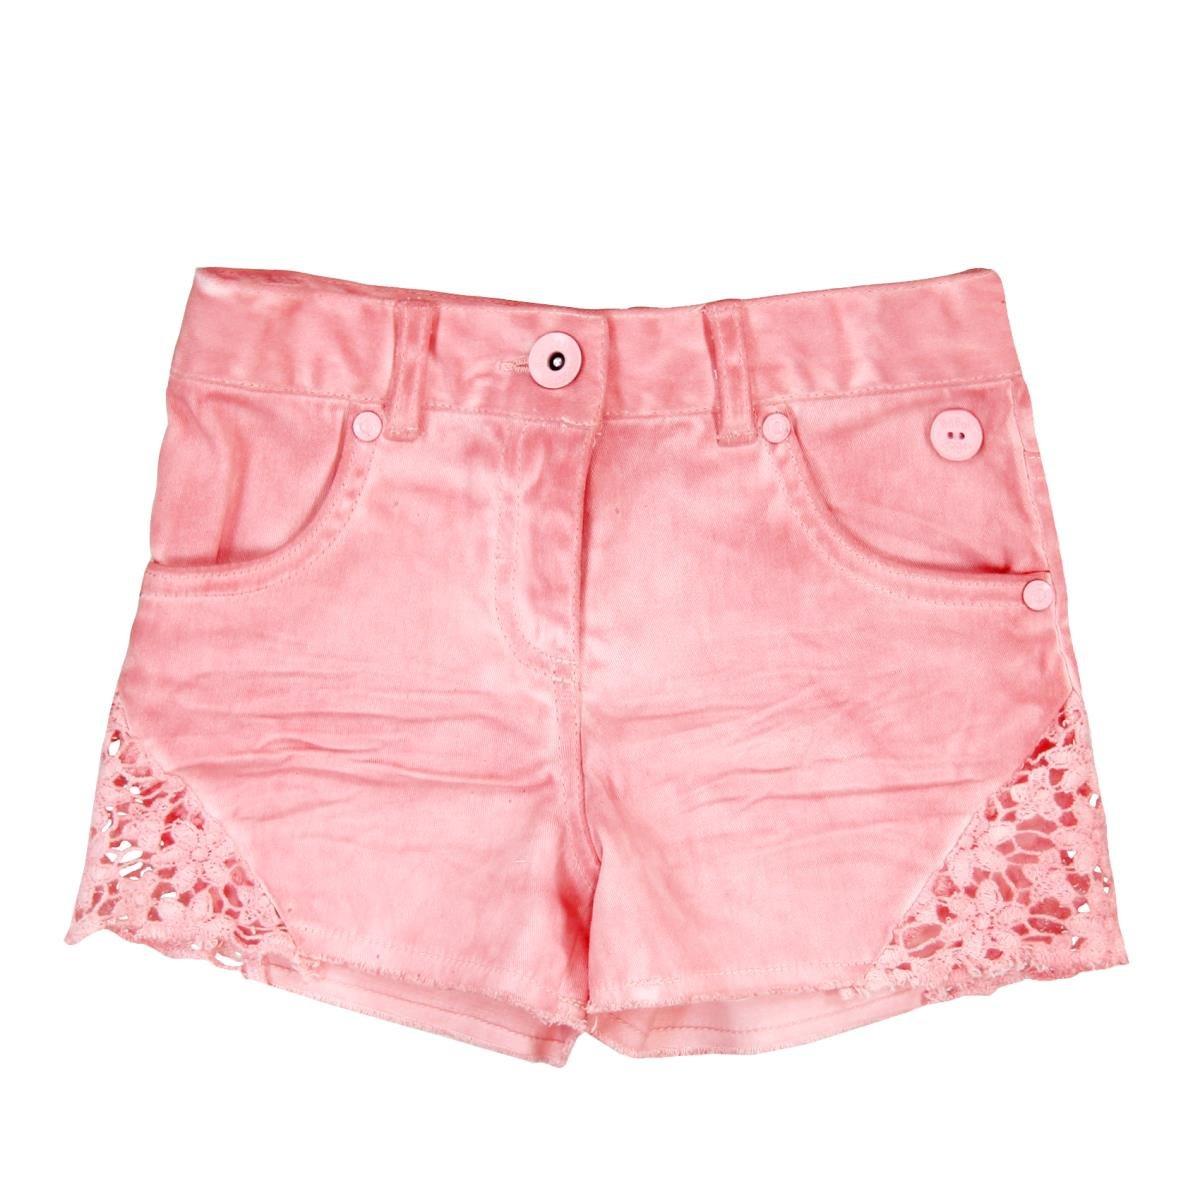 boboli Stretch Twil Shorts For Girl, Pantaloncini Bambina Bóboli 403029